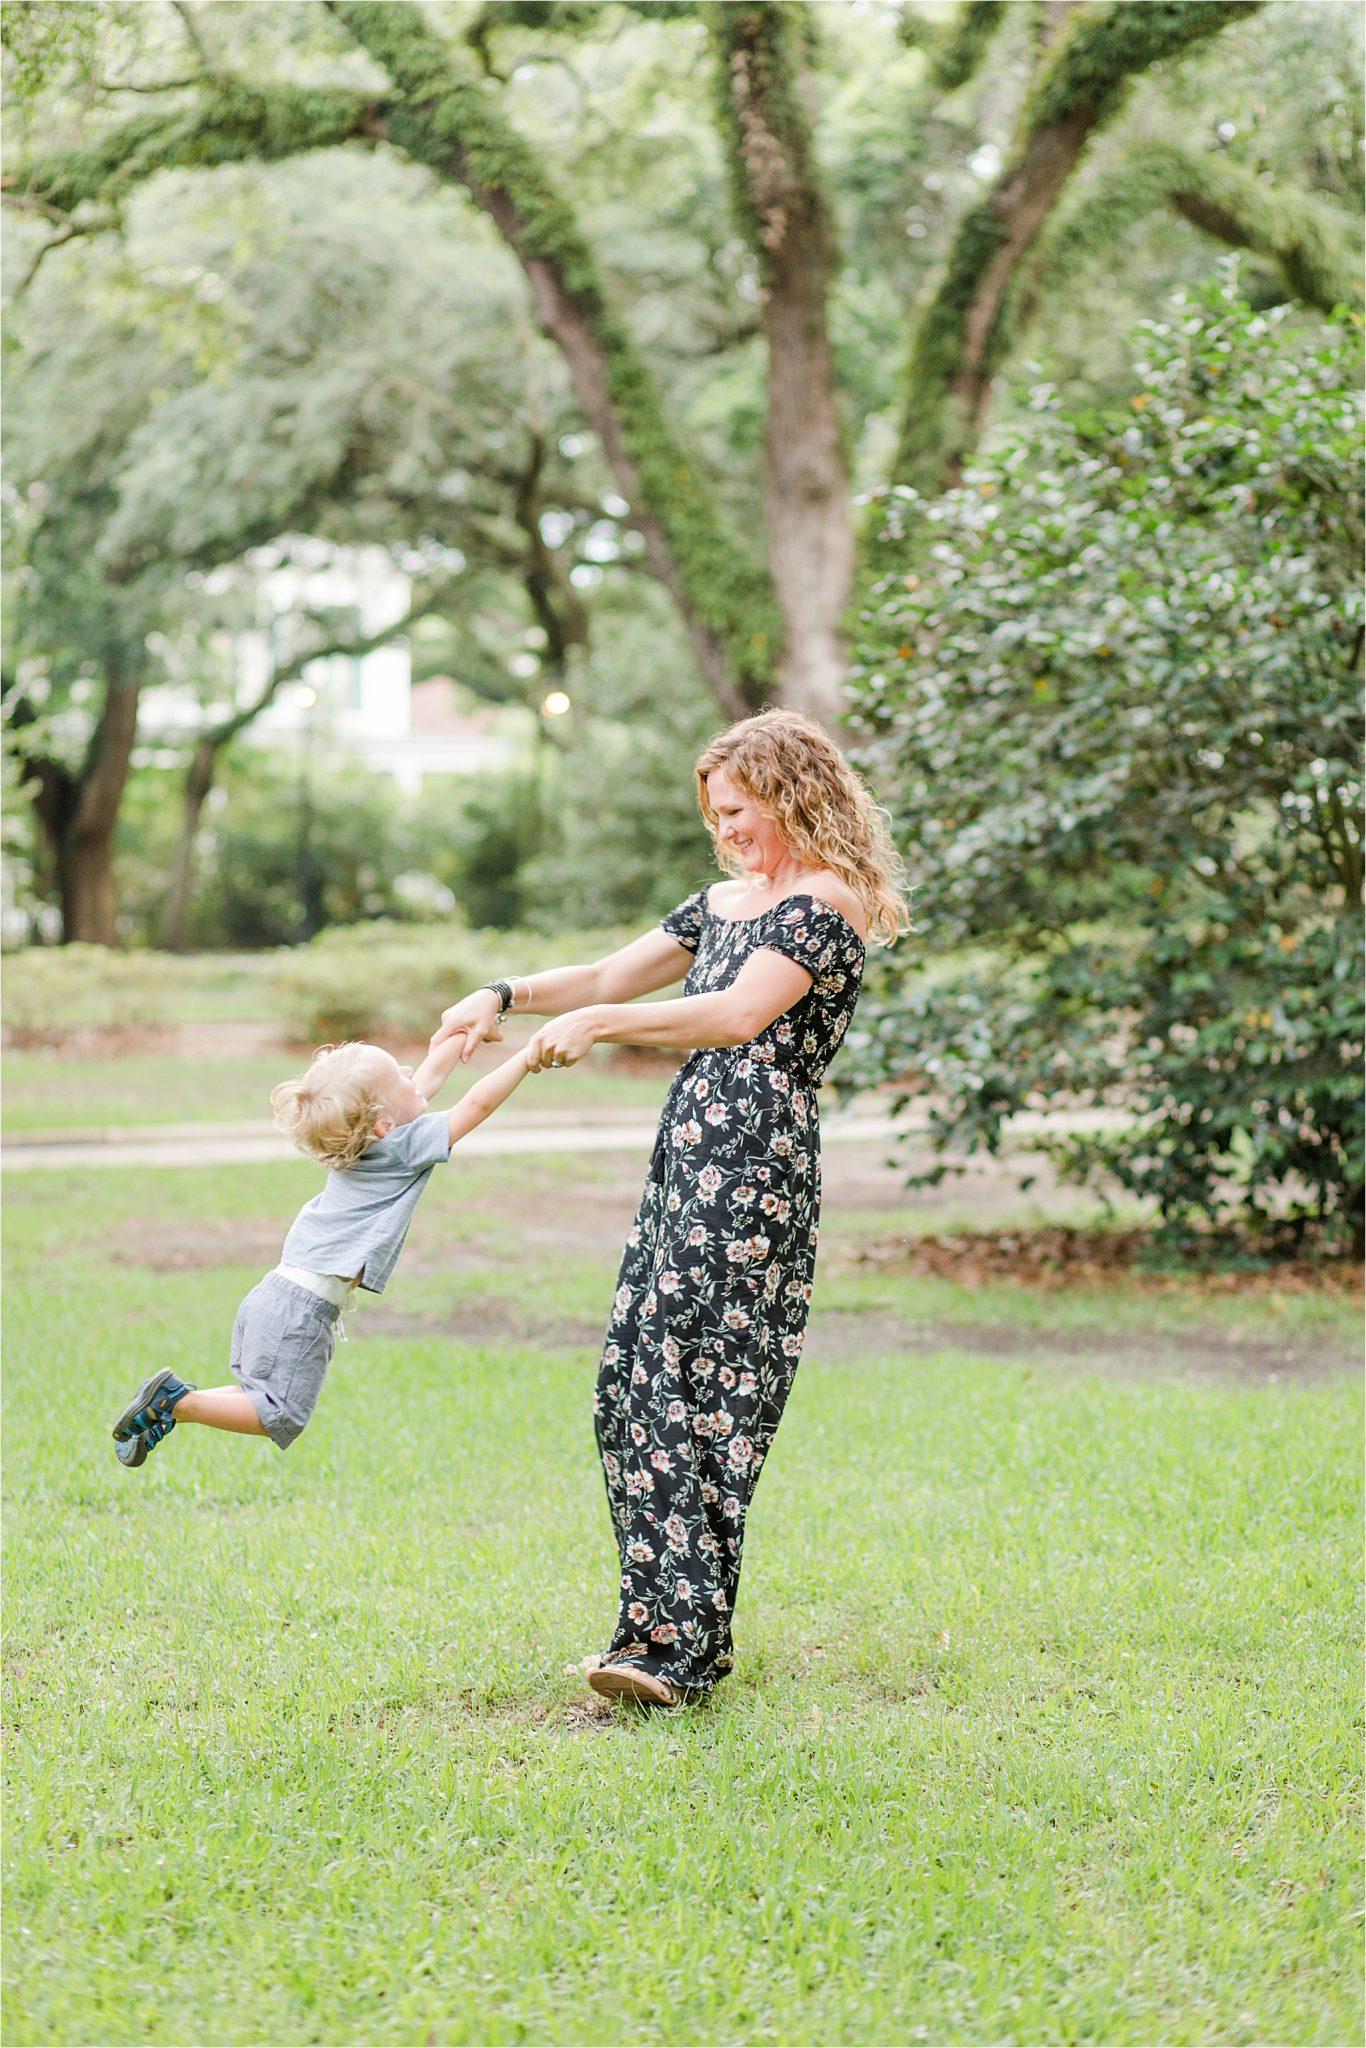 mother and son photos-family photography-Alabama family photographer-toddler photos-mommy and son photos-mother